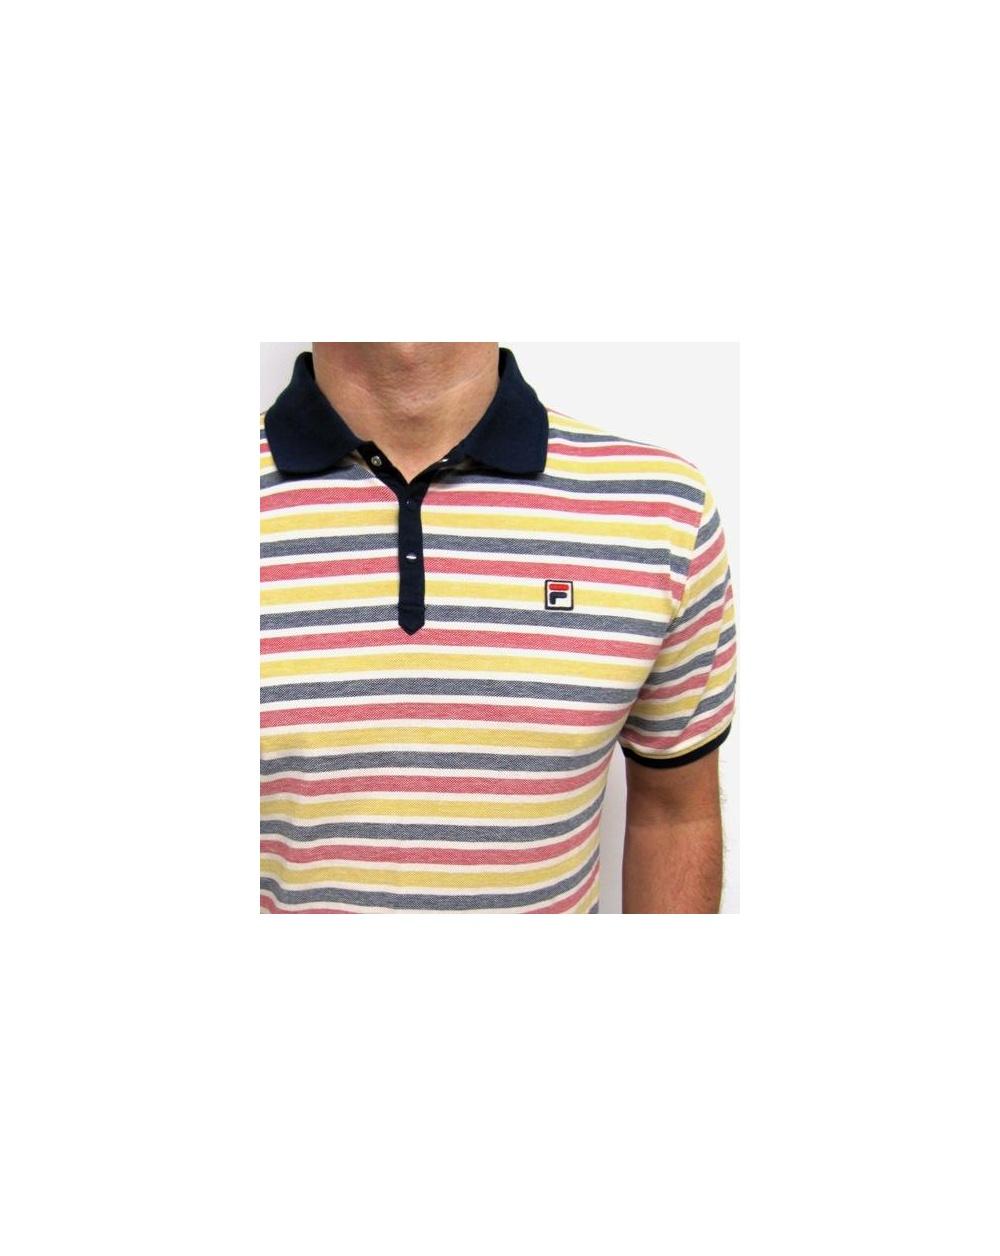 Fila Vintage Paradocks Striped Polo Shirt Navy Yellow Red